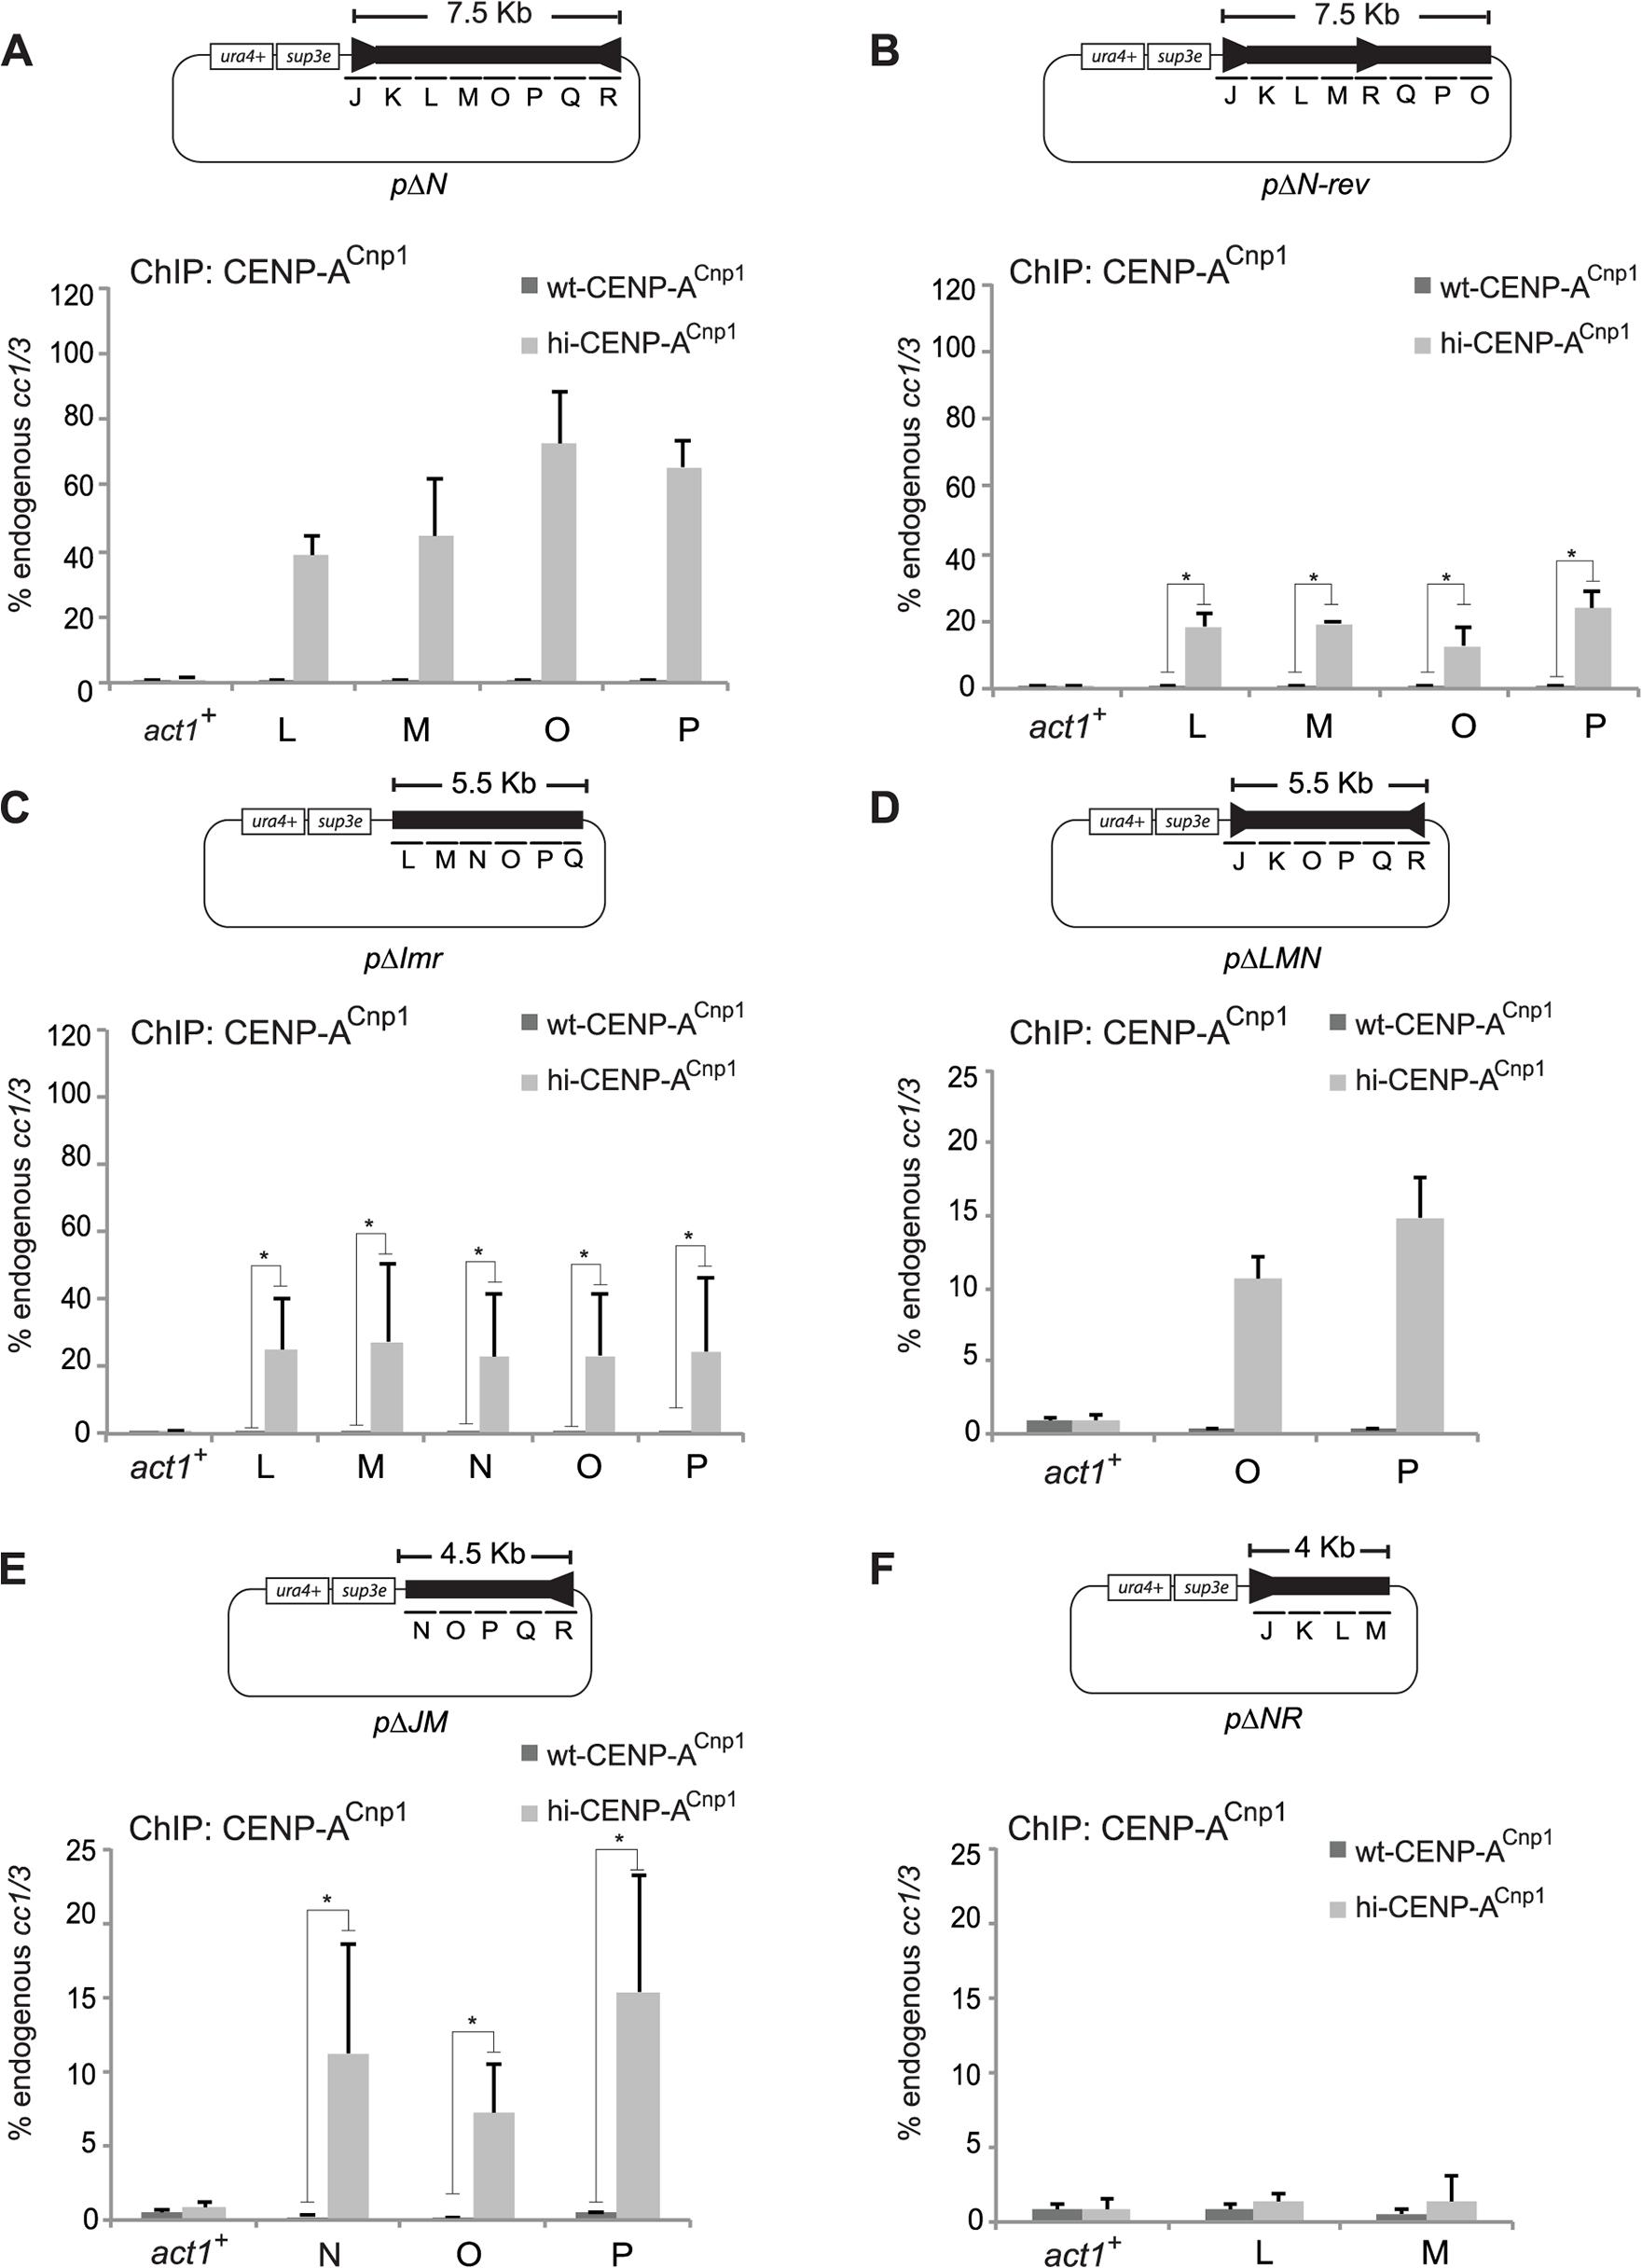 Centromeric DNA sequence affects CENP-A<sup>Cnp1</sup> chromatin establishment.